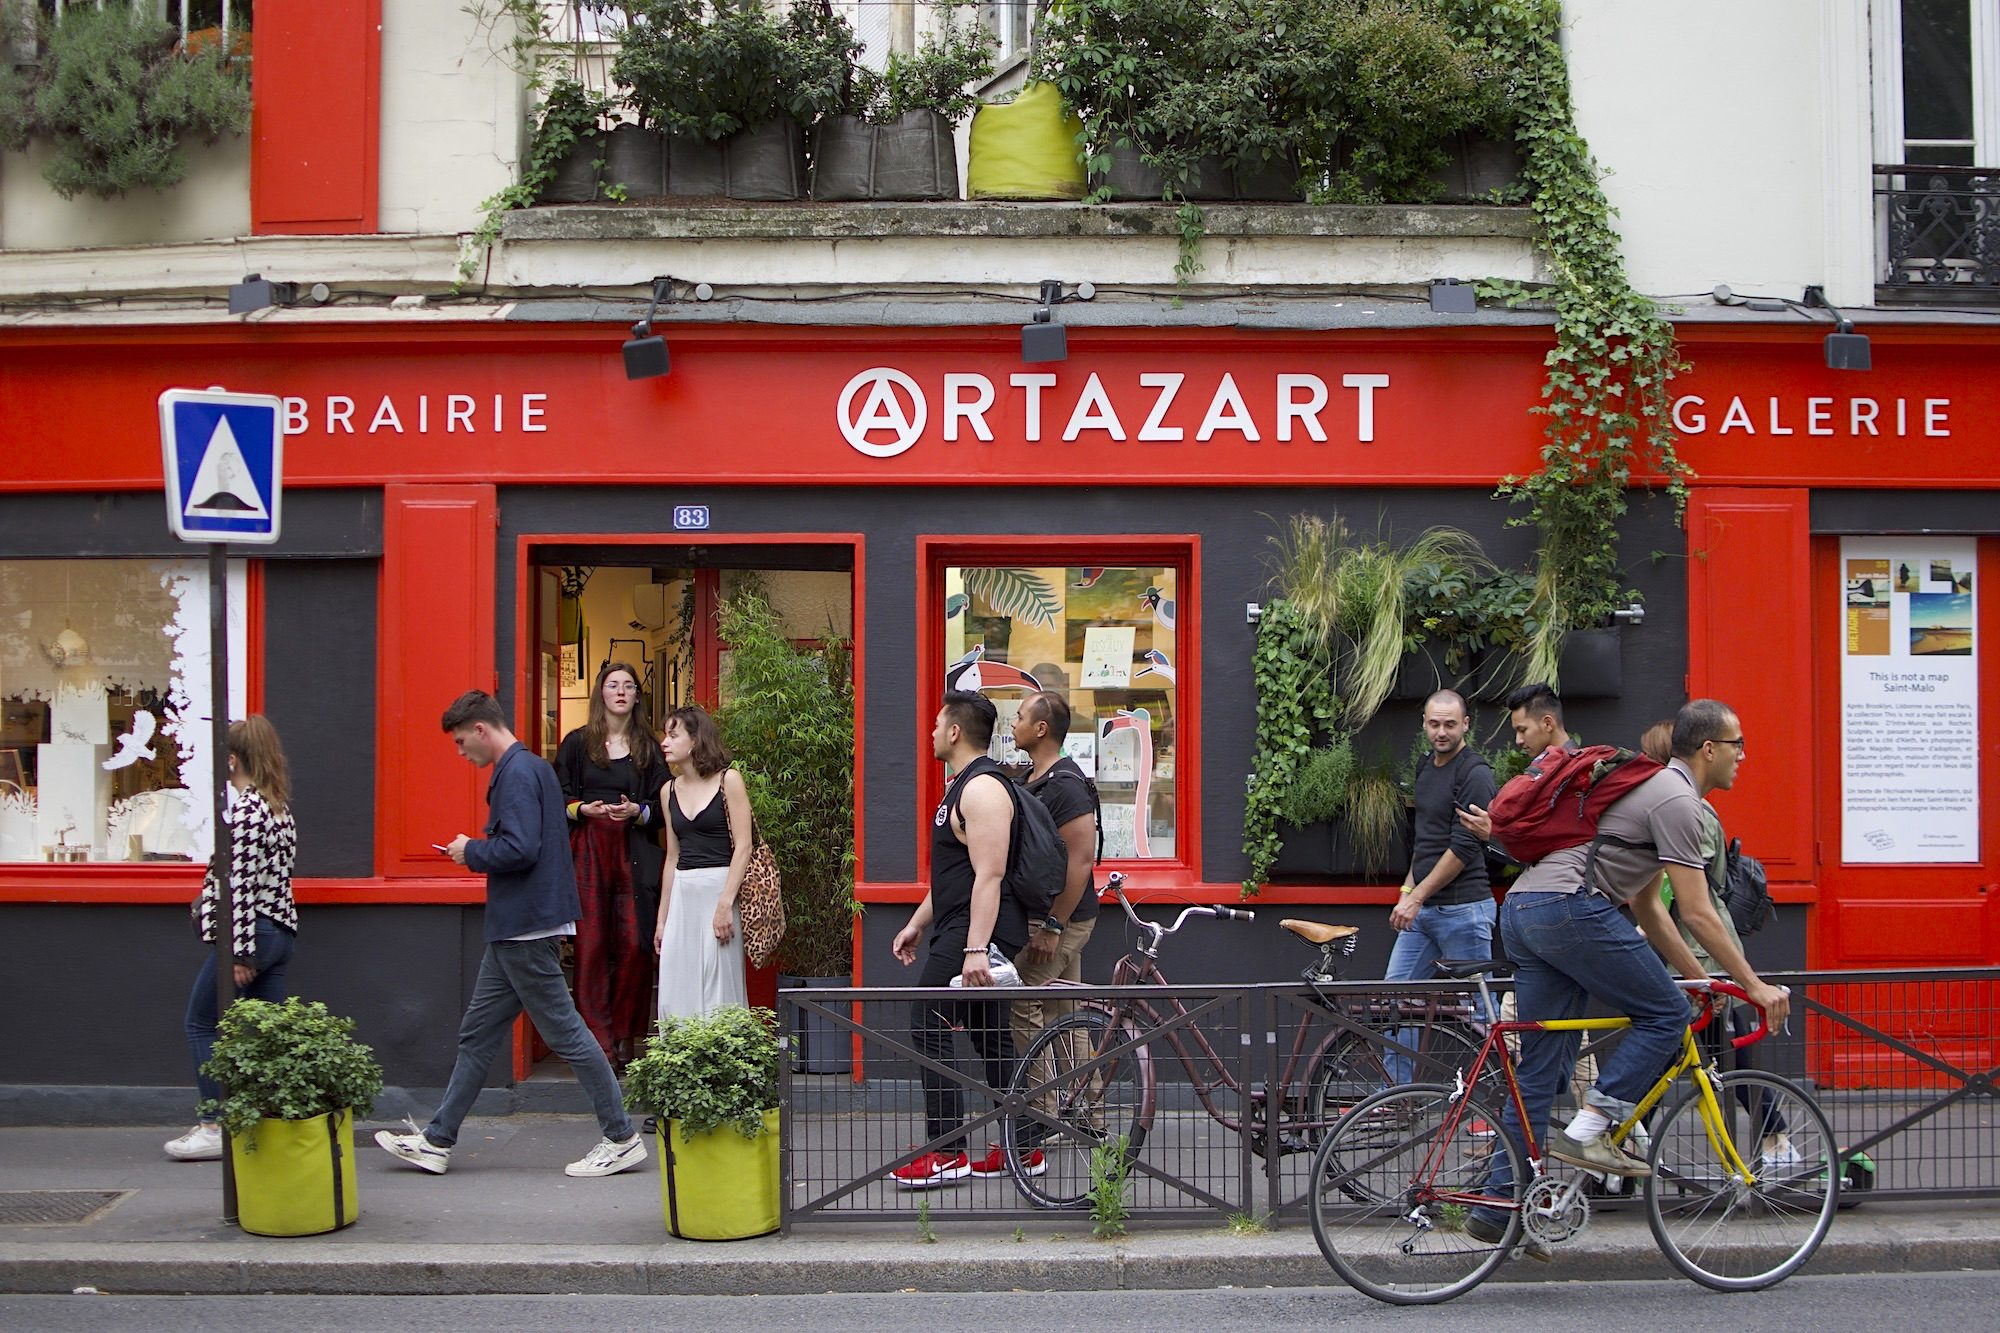 Artazart, a popular arty bookshop along the Canal Saint Martin in Paris.